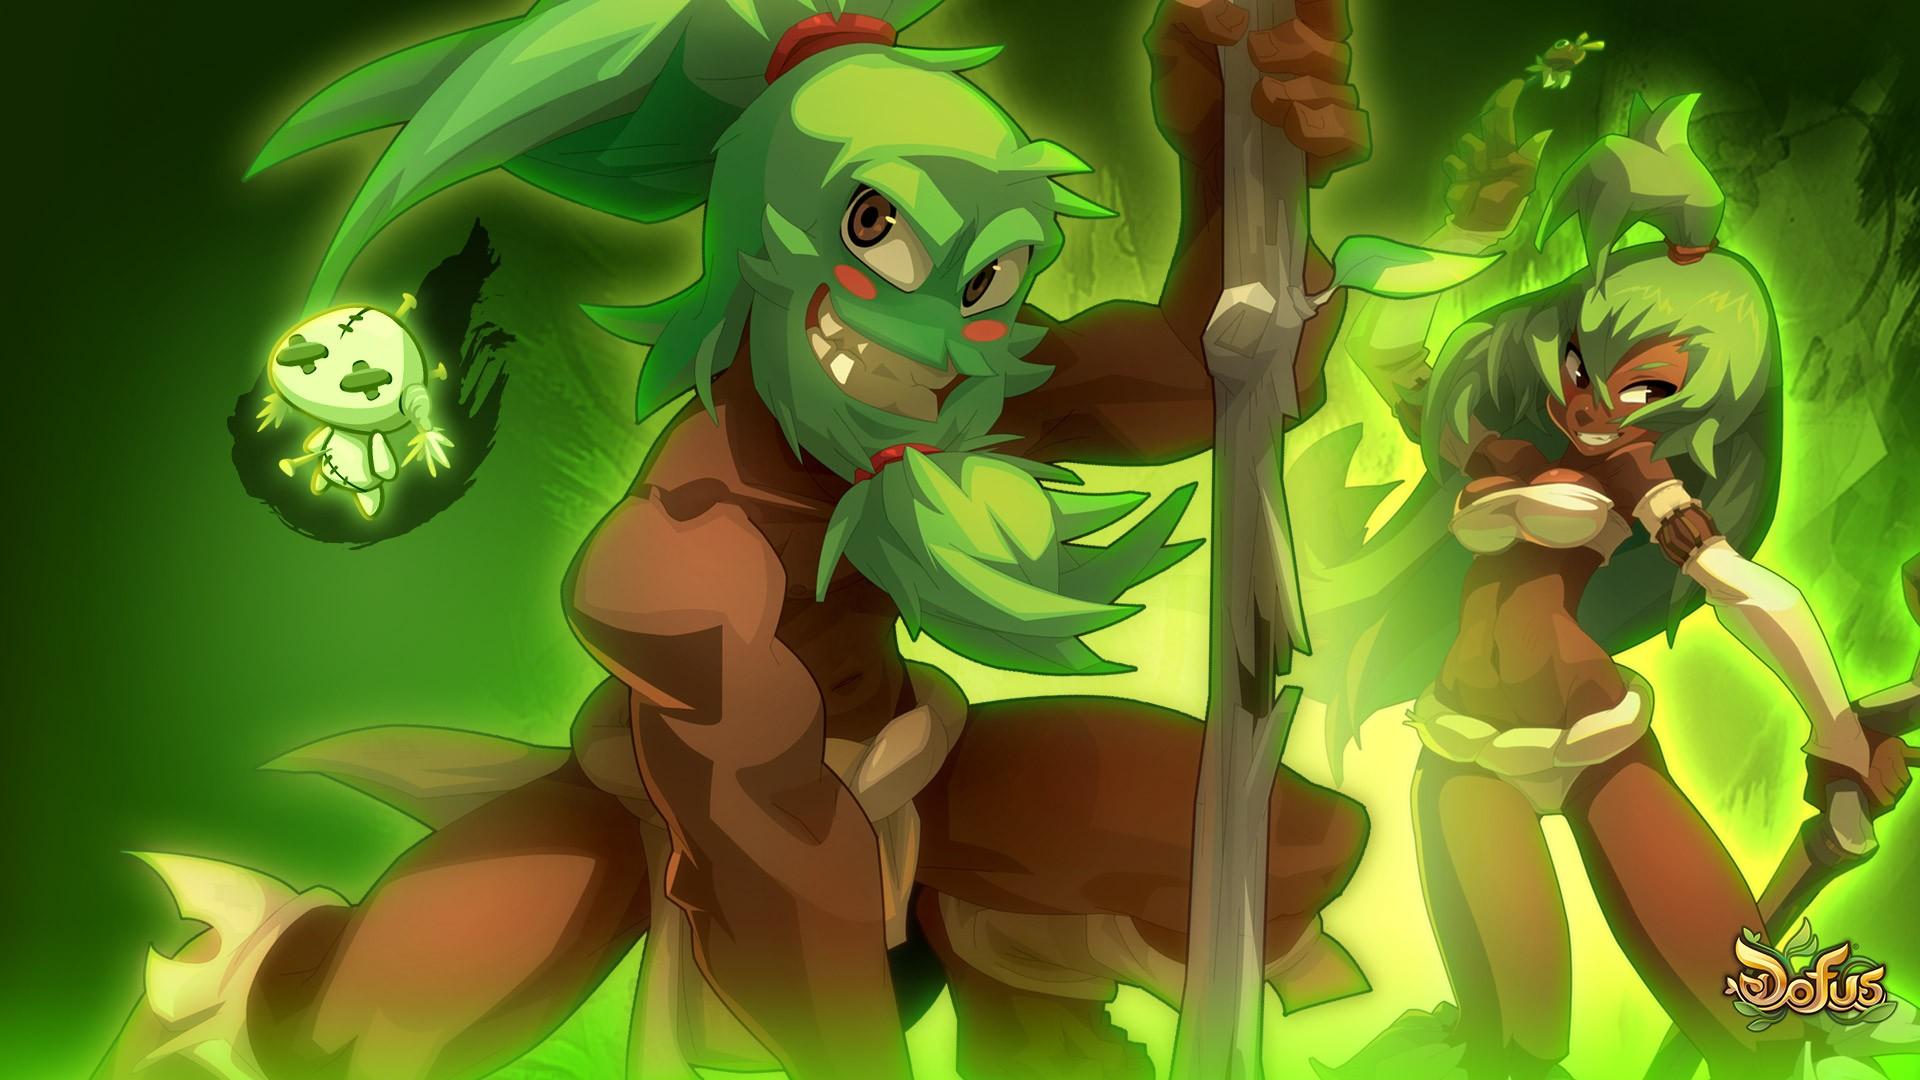 Fondos De Pantalla Ilustración Anime Verde Dibujos